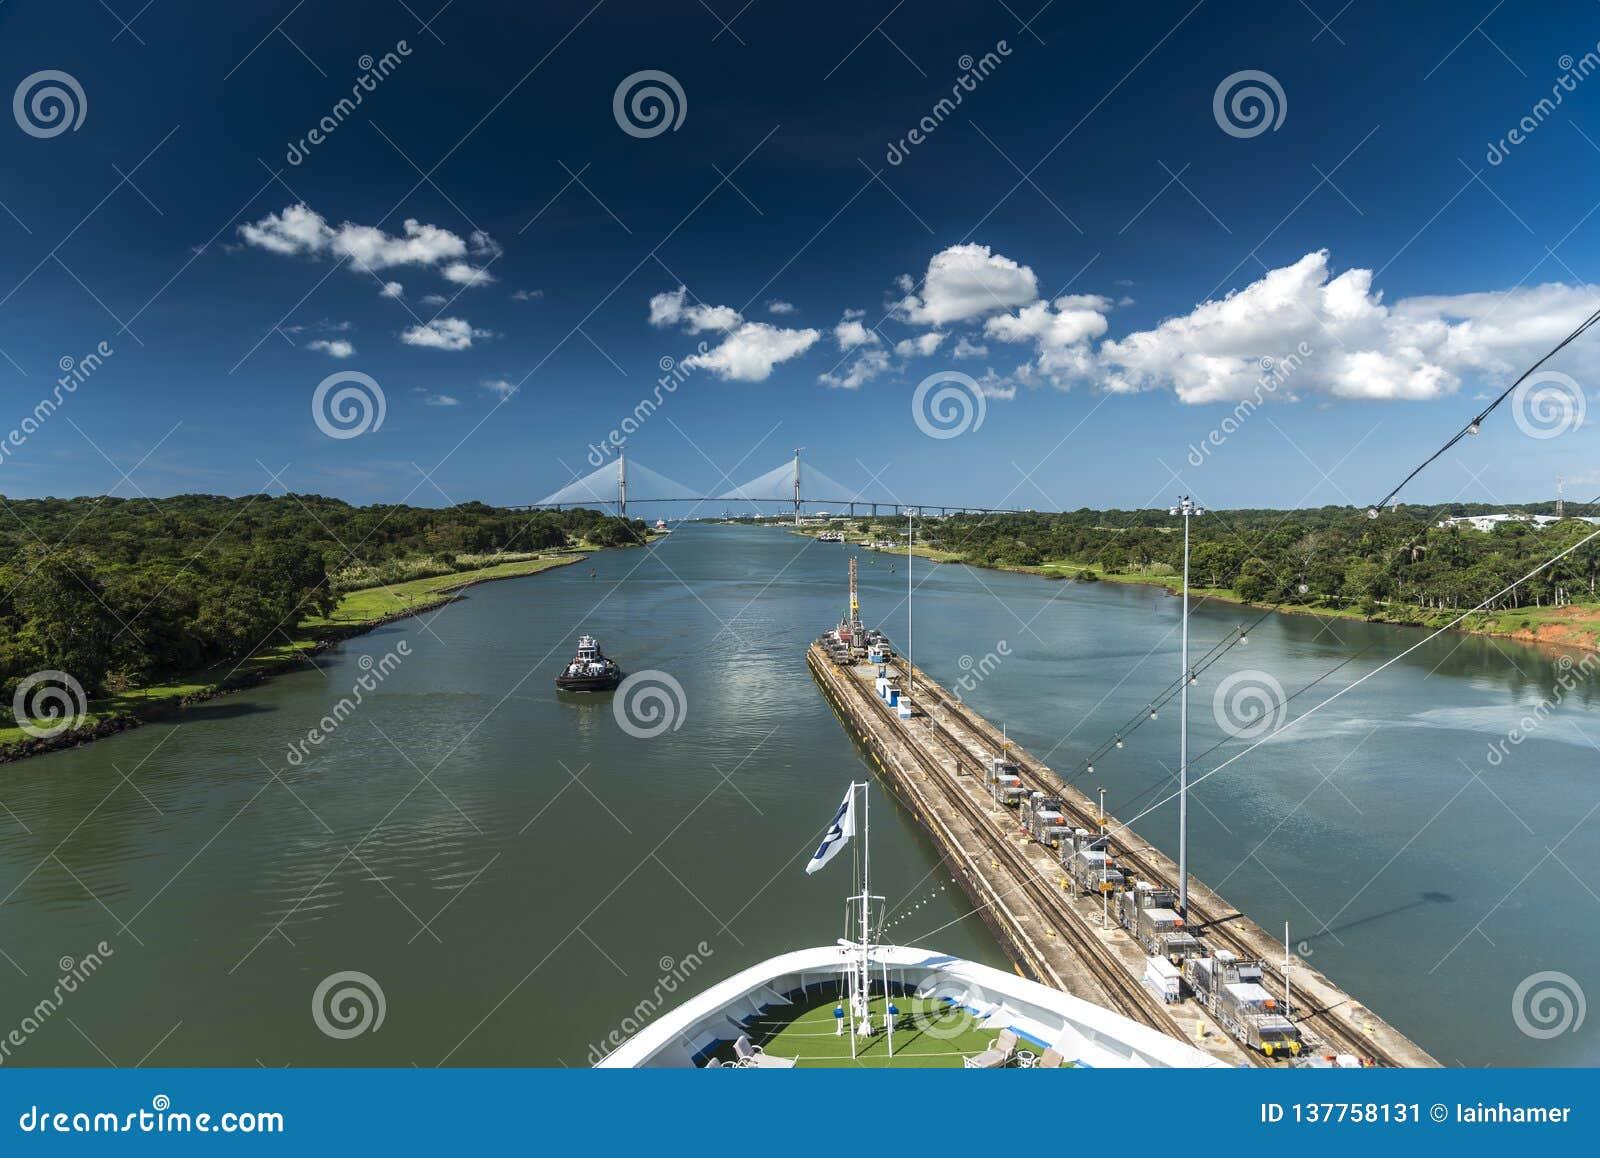 Island Princess exiting the Gatun Locks Panama canal